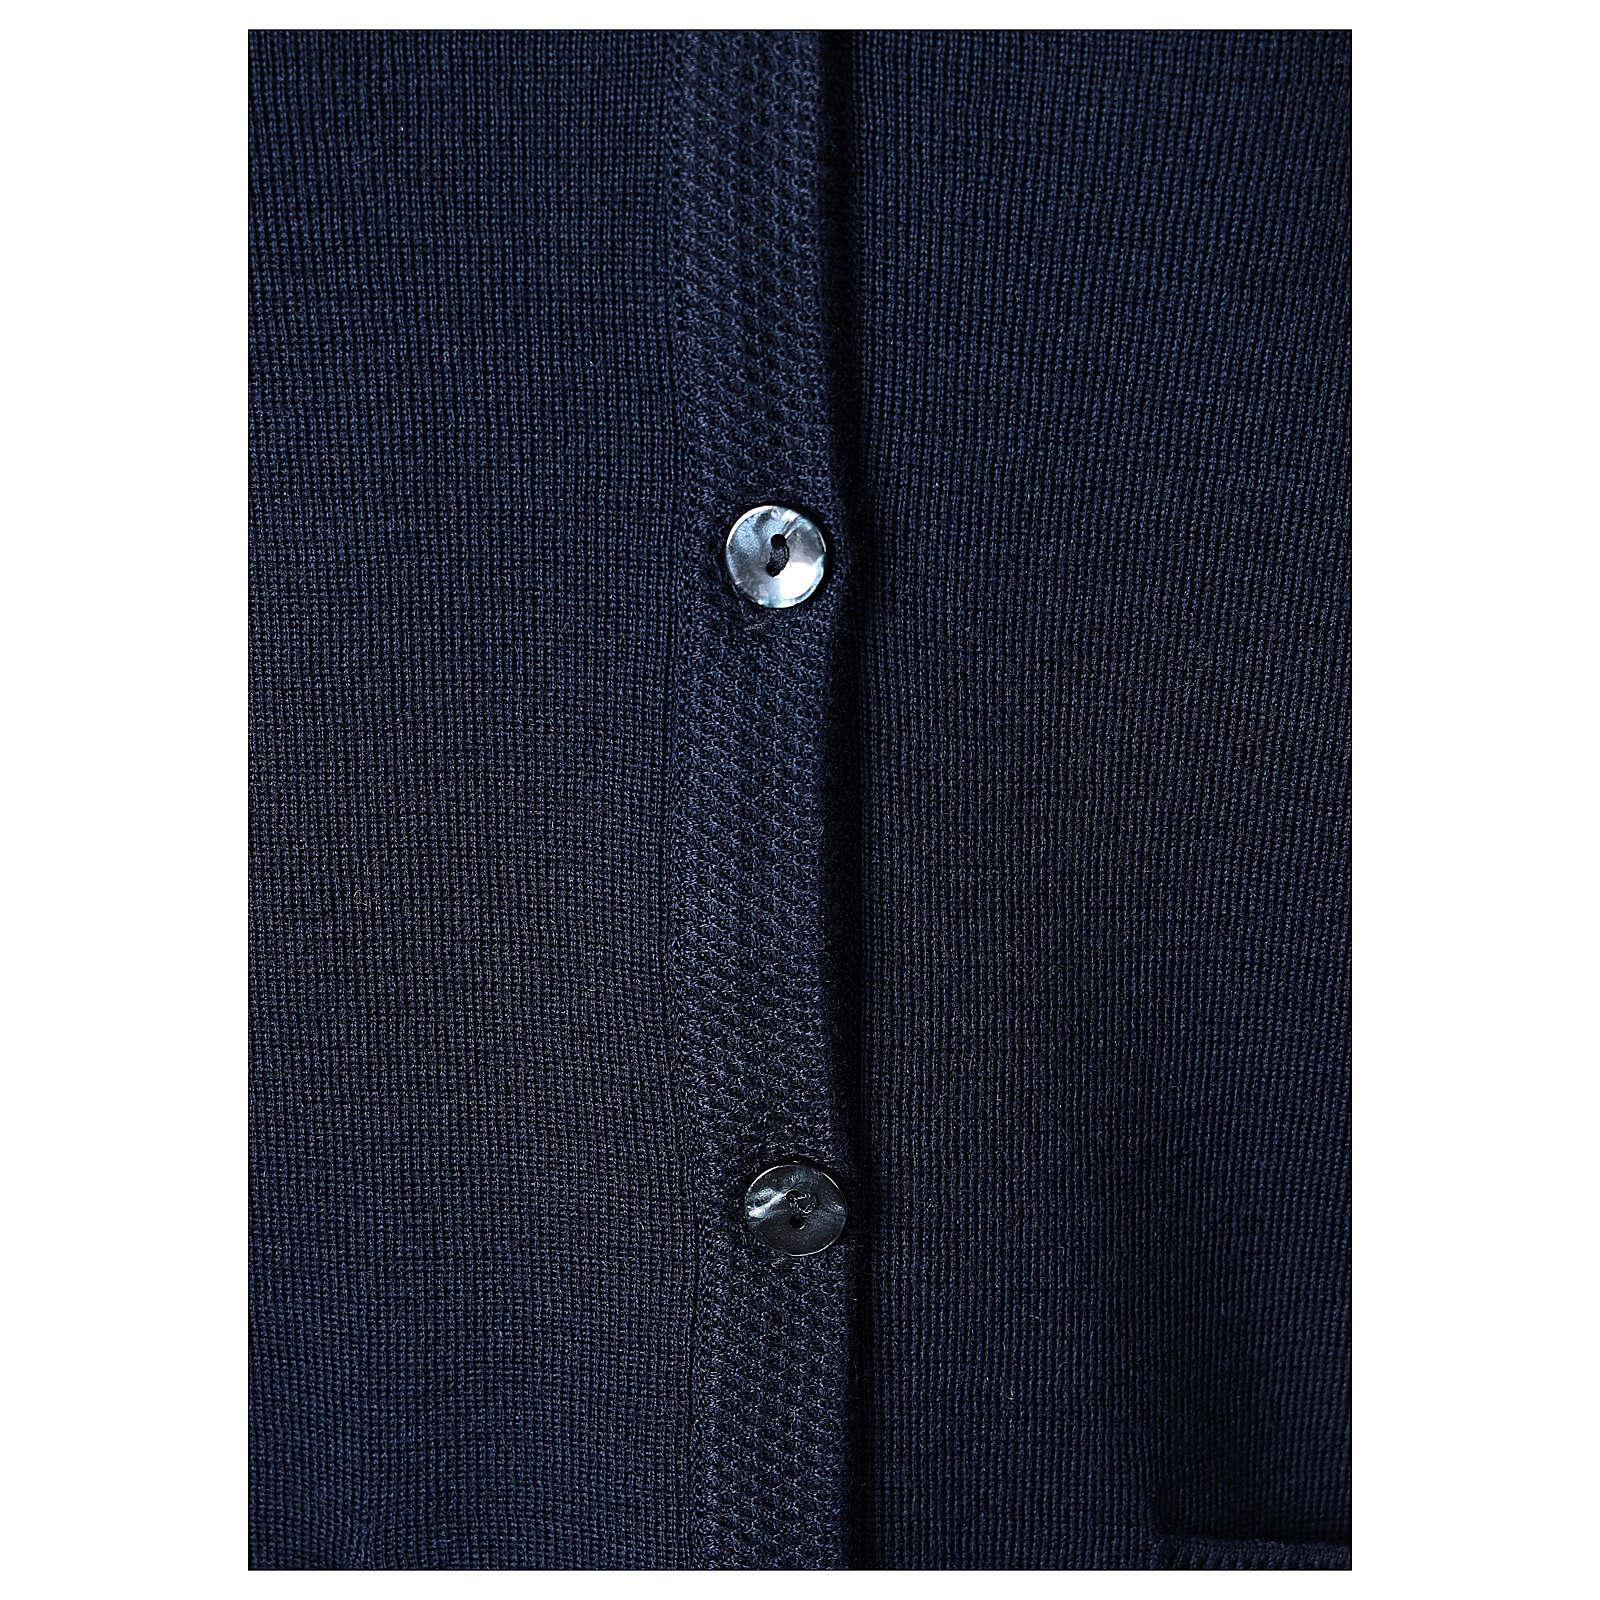 Blue V-neck nun cardigan with pockets 50% acrylic 50% merino wool In Primis 4